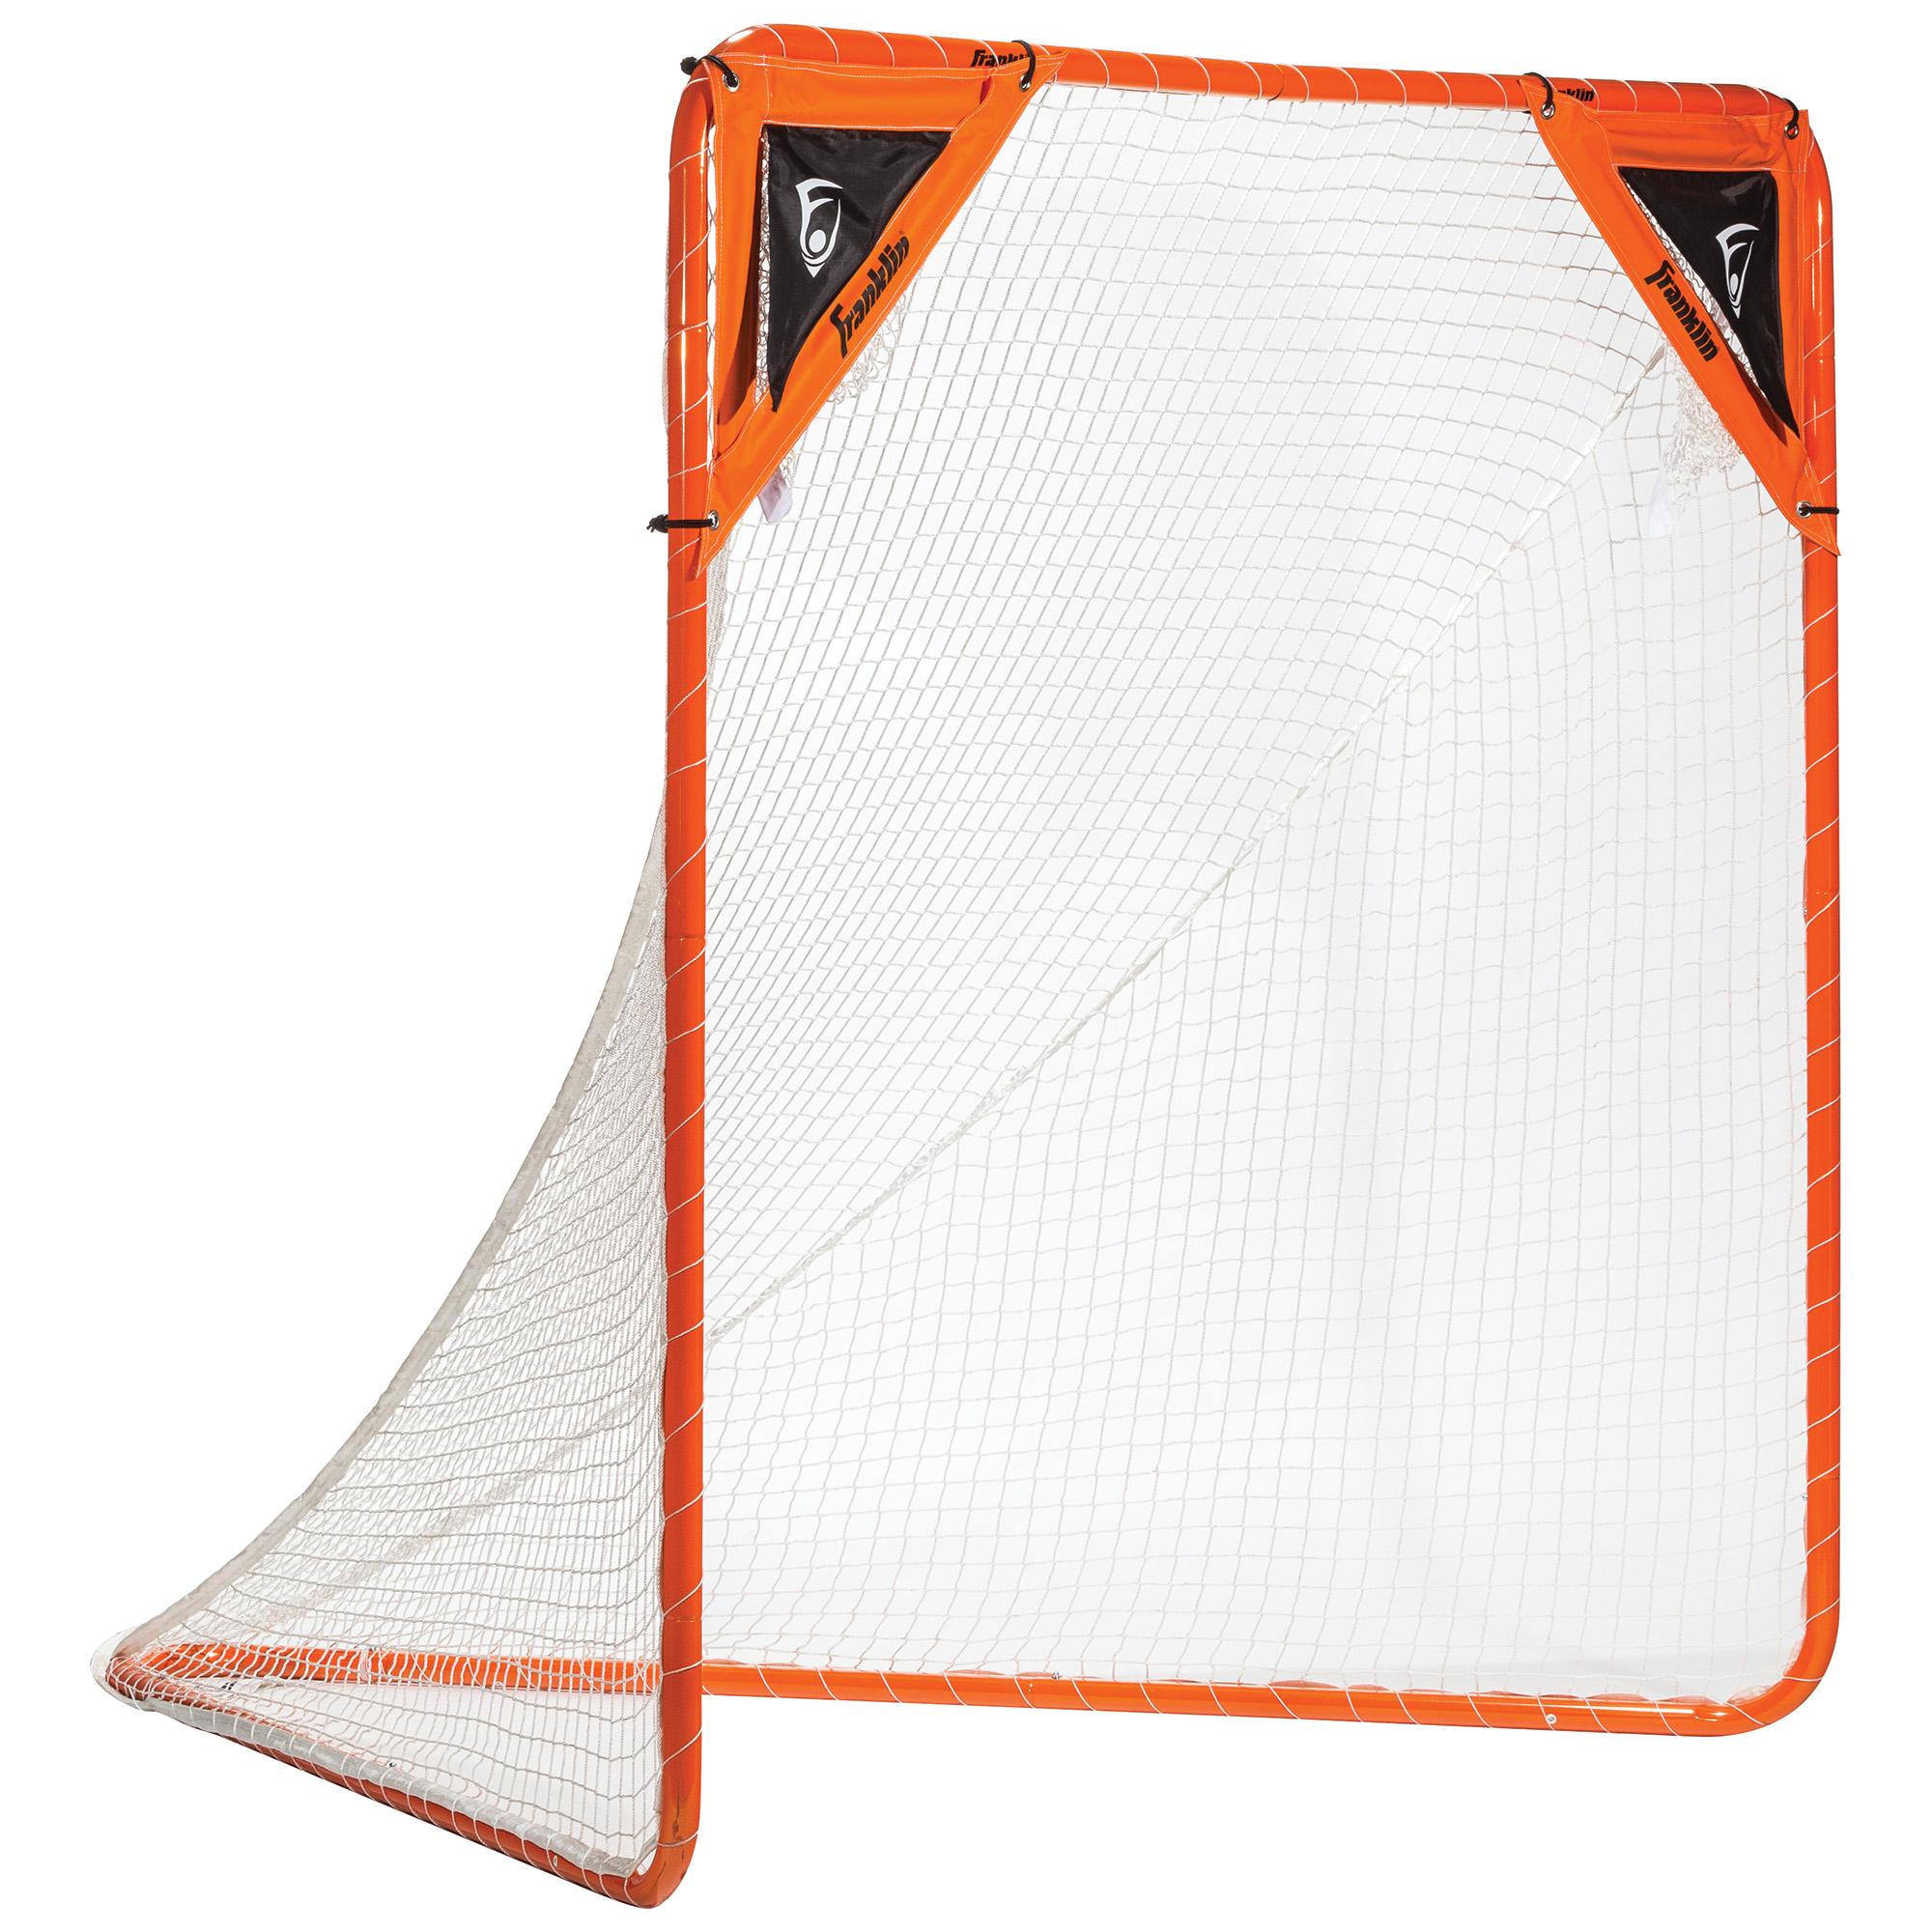 Franklin Sports Lacrosse Corner Shooting Targets